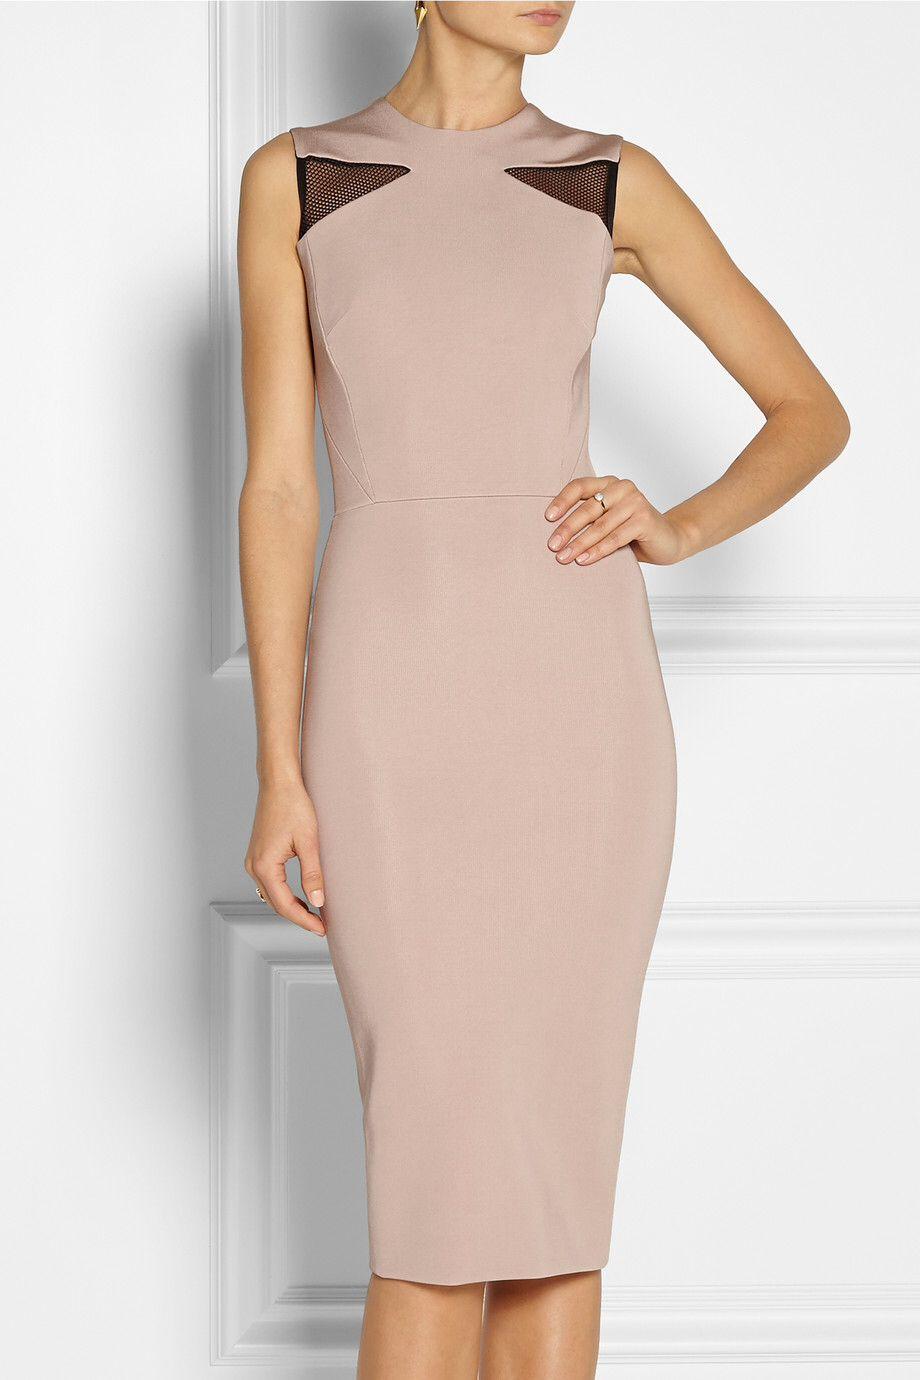 Cream Is A New Skin Ponte Dress Dresses Victoria Beckham Dress [ 1380 x 920 Pixel ]